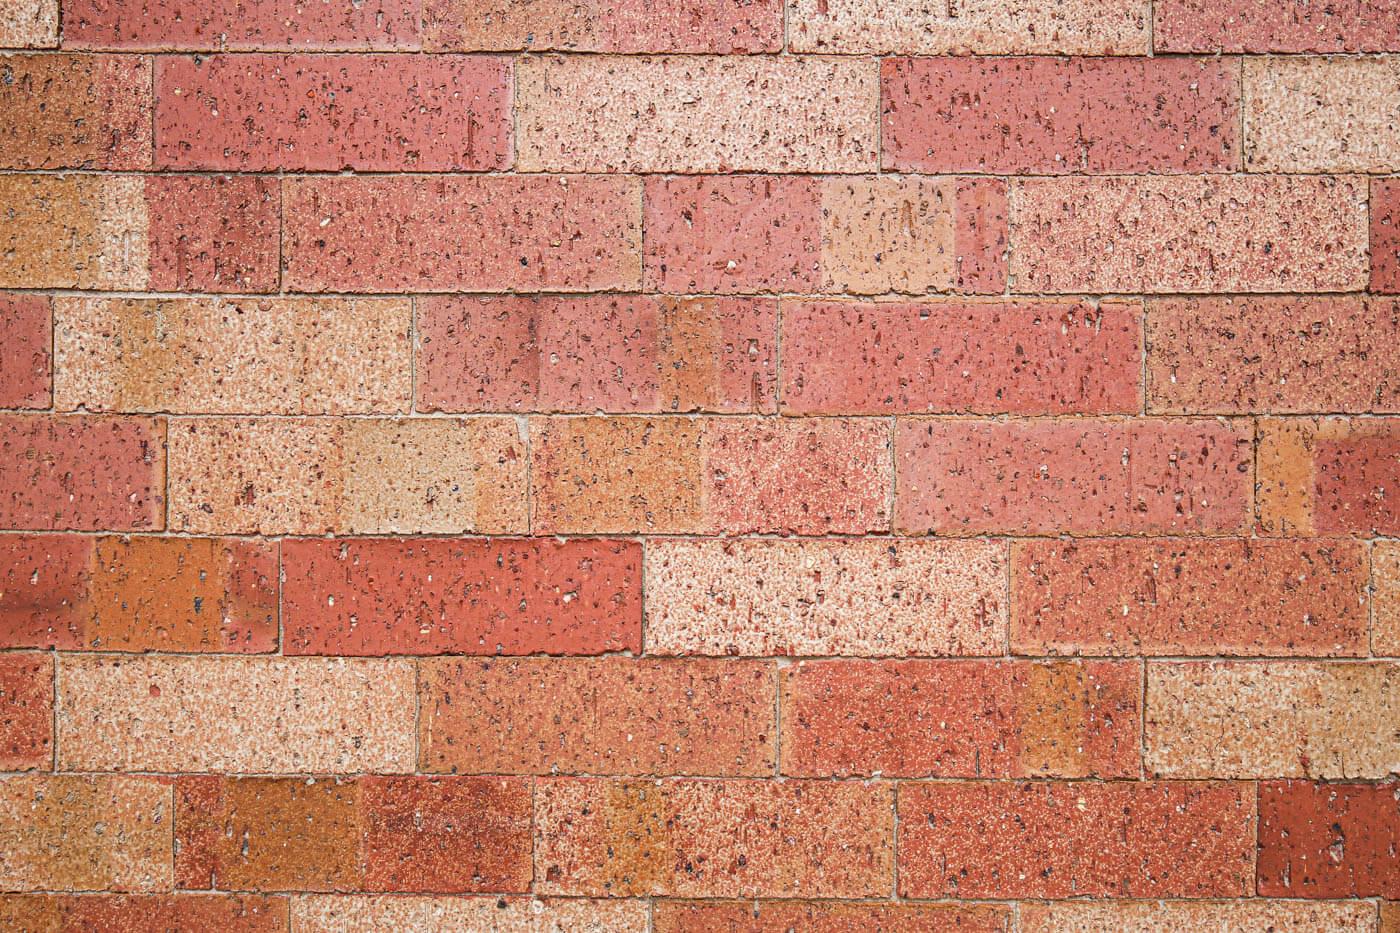 Stardust Rouge Paver 230mm X 76mm X 62mm Littlehampton Bricks And Pavers Rs 11